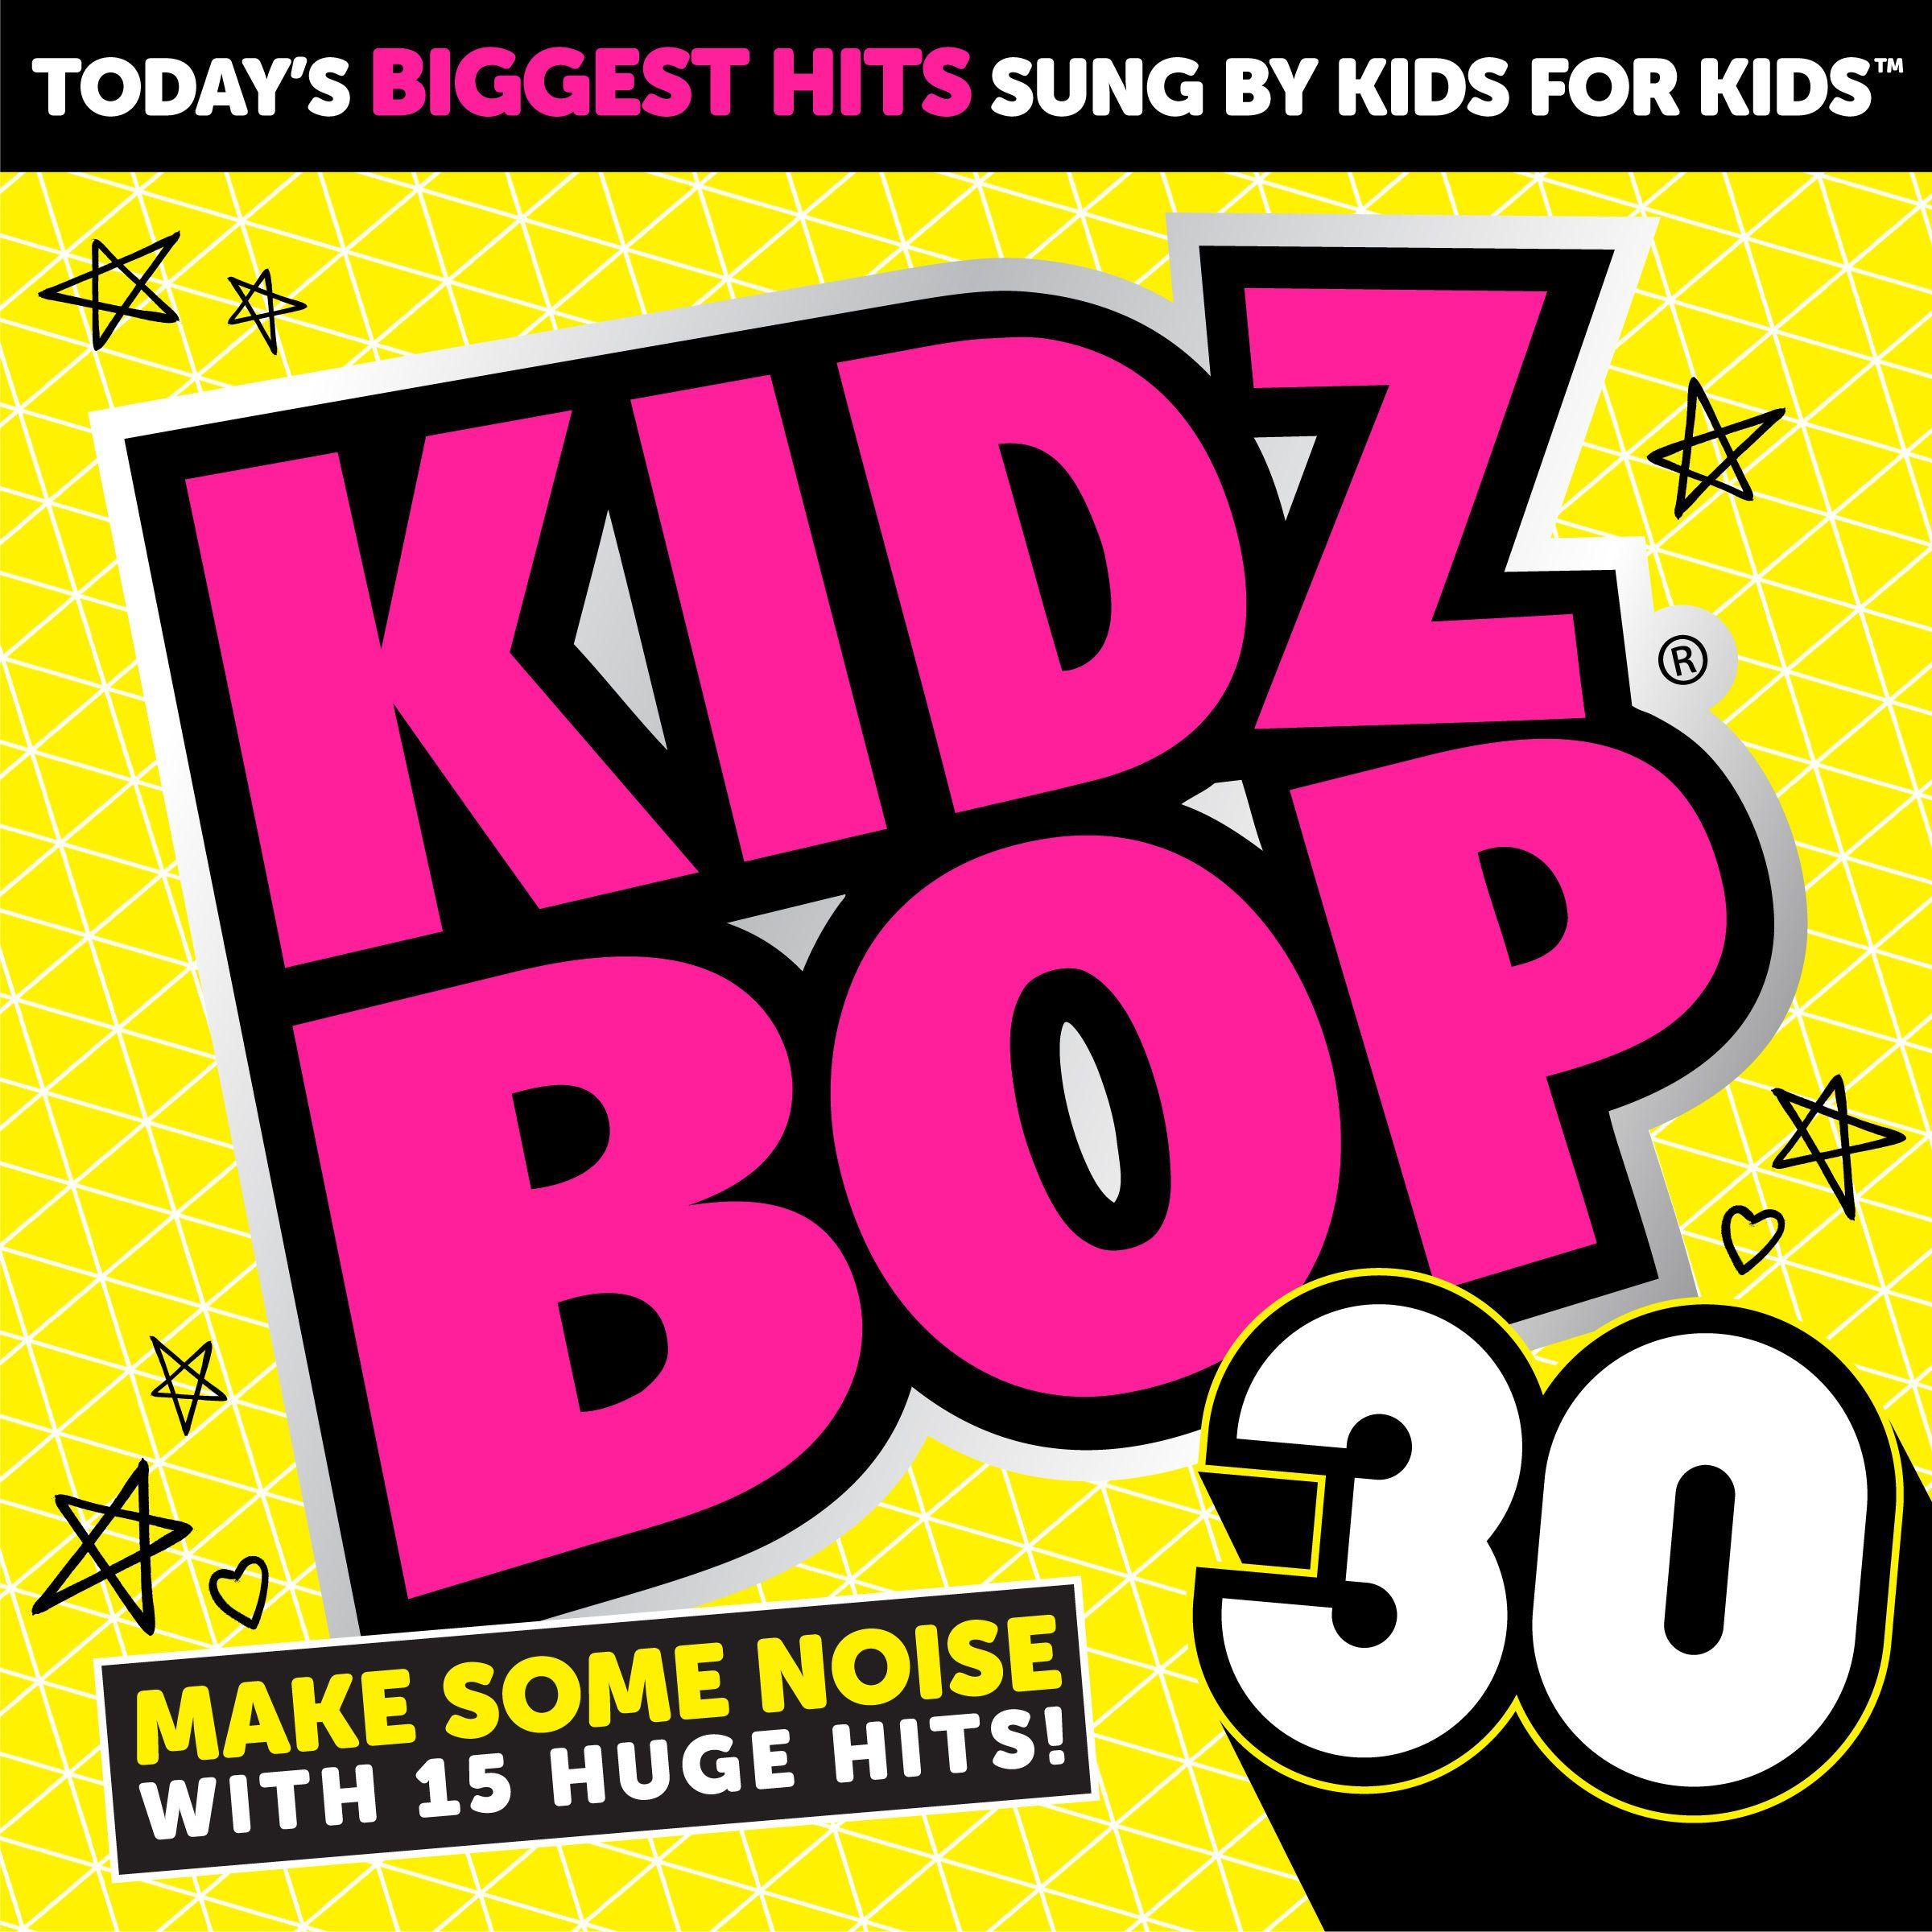 Kidz Bop 30 by KIDZ BOP Kids on iTunes | Kids | Pinterest | Apple ...